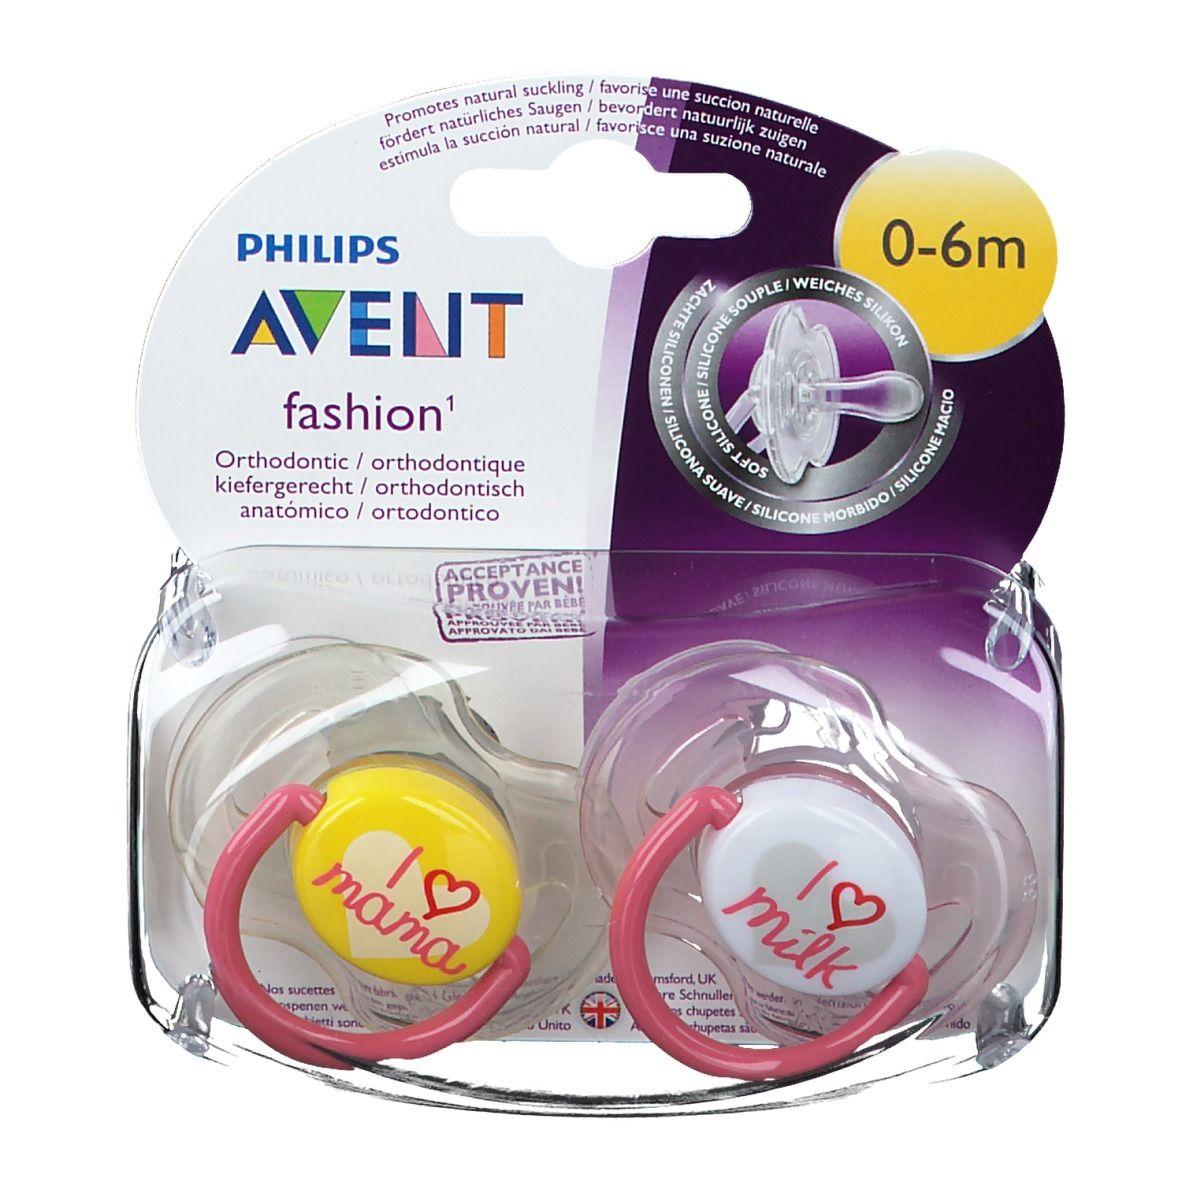 Philips Avent Fashion Sucettes 0-6 mois x2